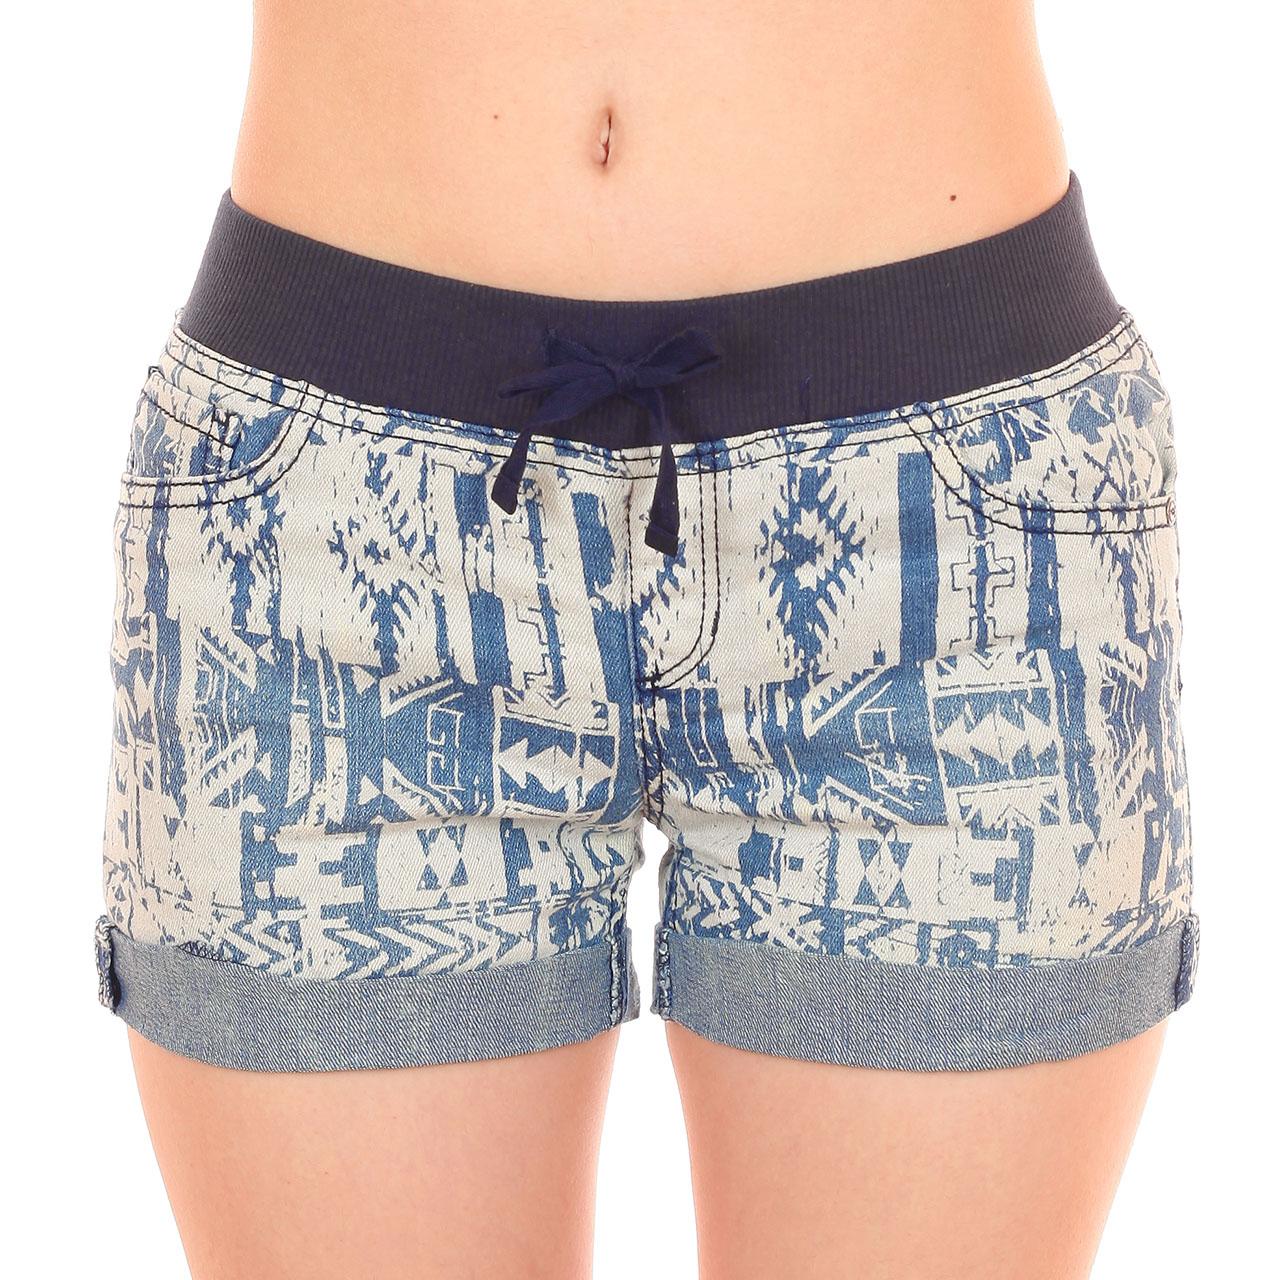 Короткие женские шорты из коллекции 2017